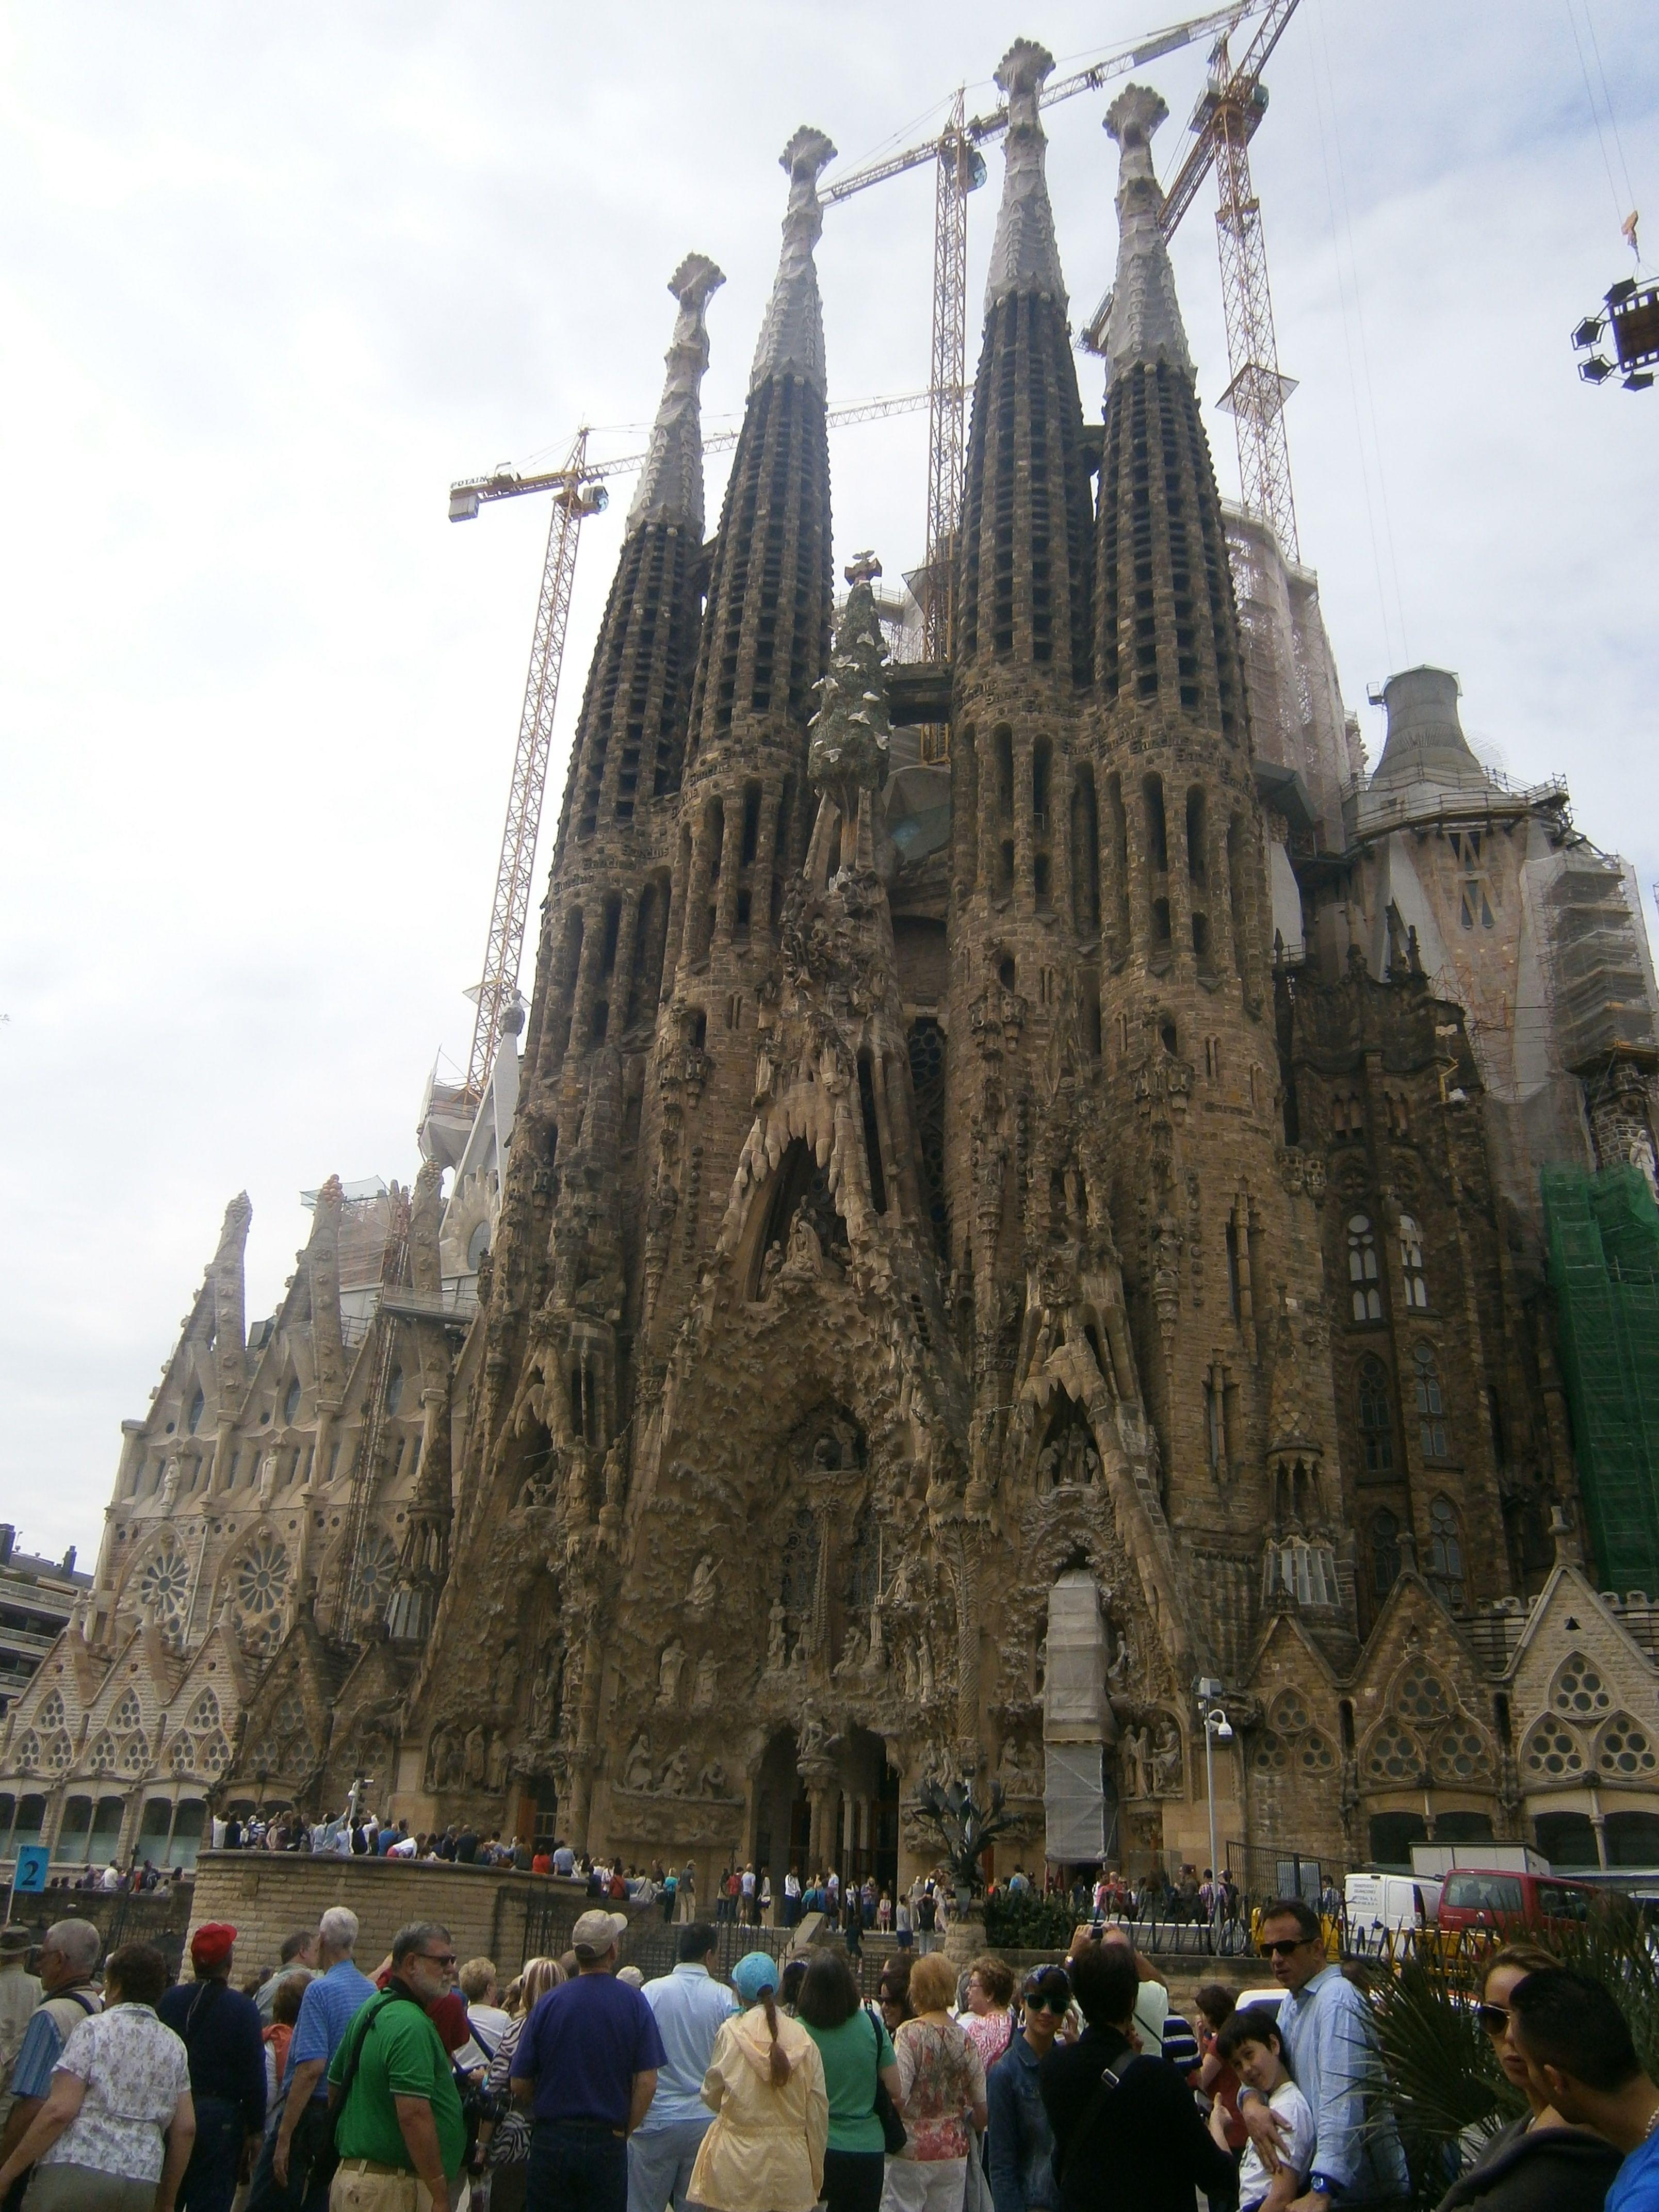 La sagrada familia barcelona spain places i 39 ve been for La sagrada familia spain